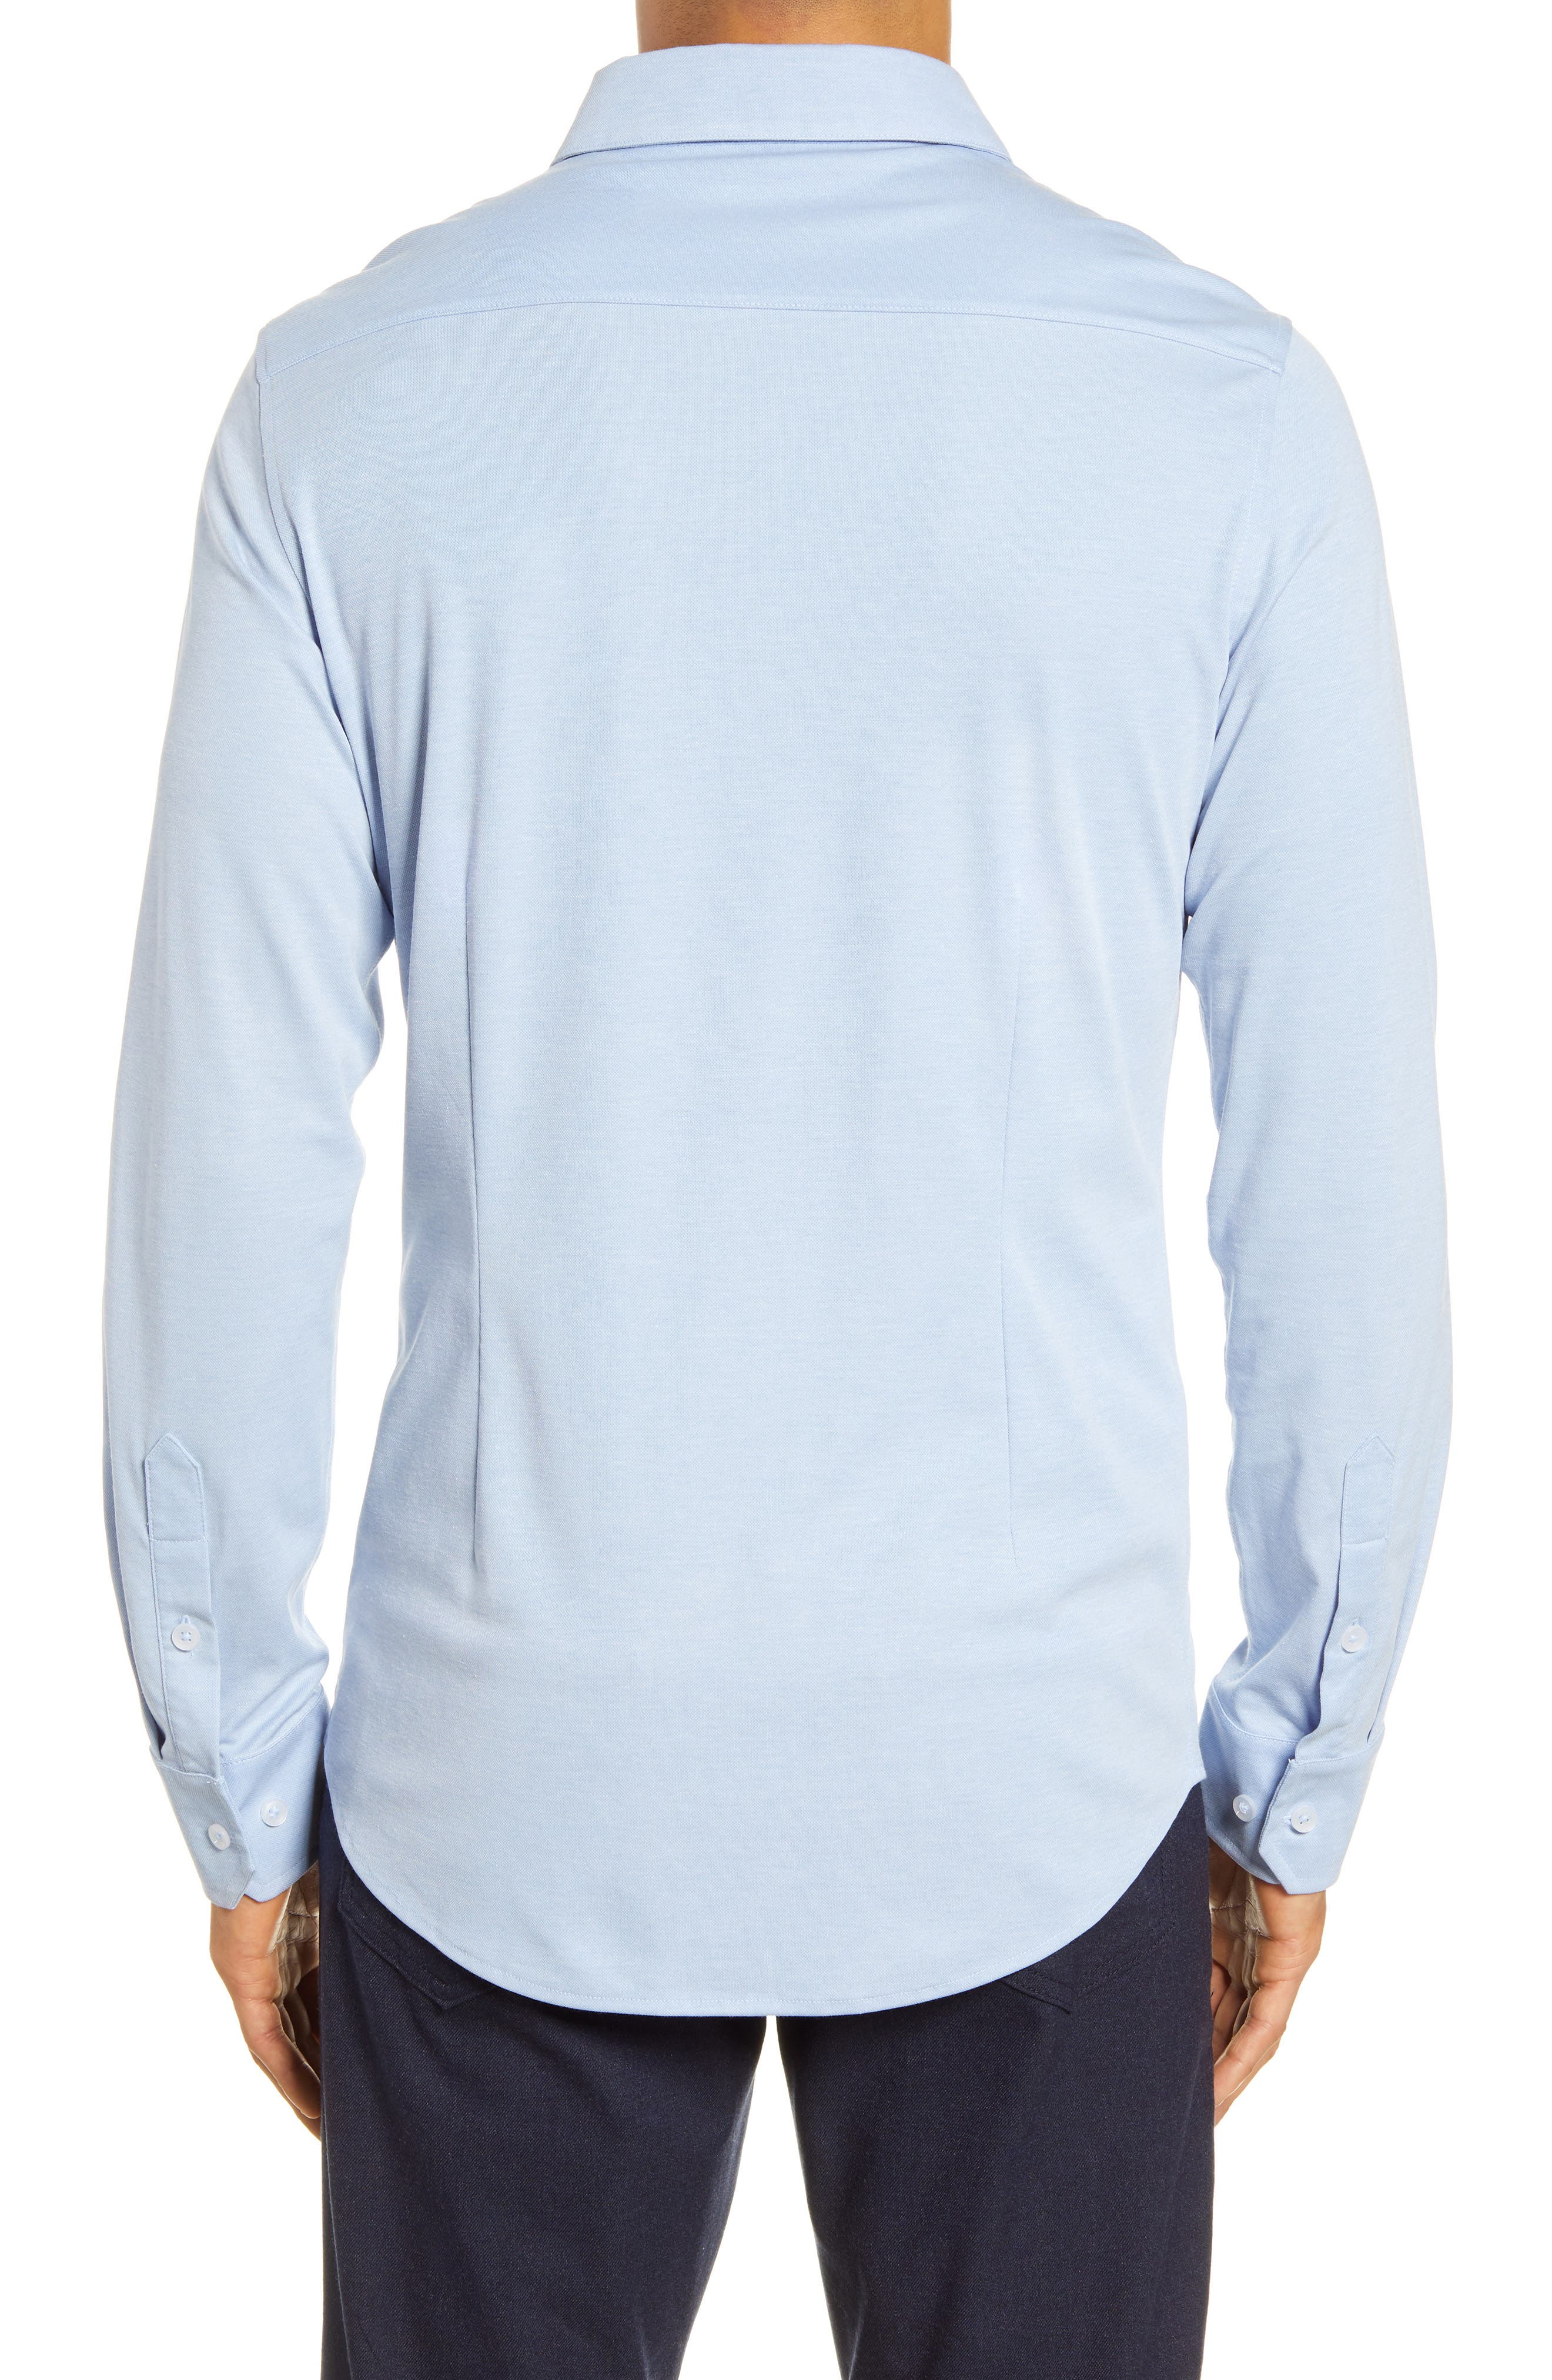 MIZZEN AND MAIN Carnegie Button-Down Performance Shirt